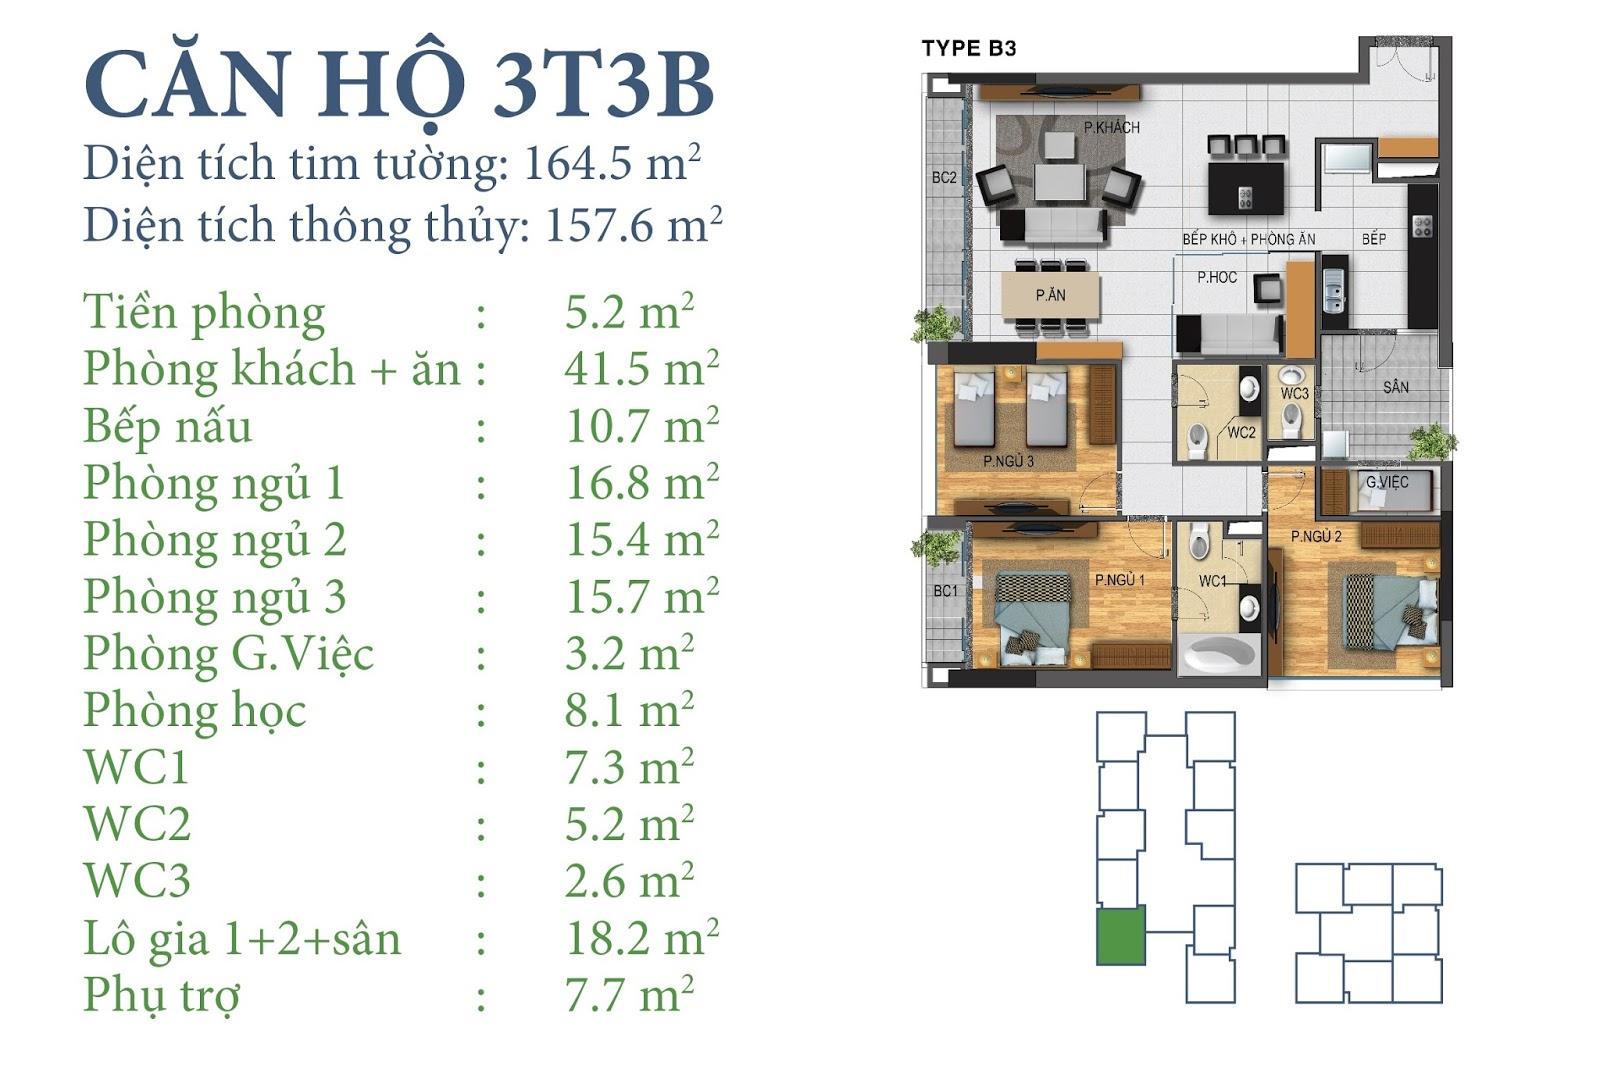 3T3B-horizon-tower-ngoai-giao-doan